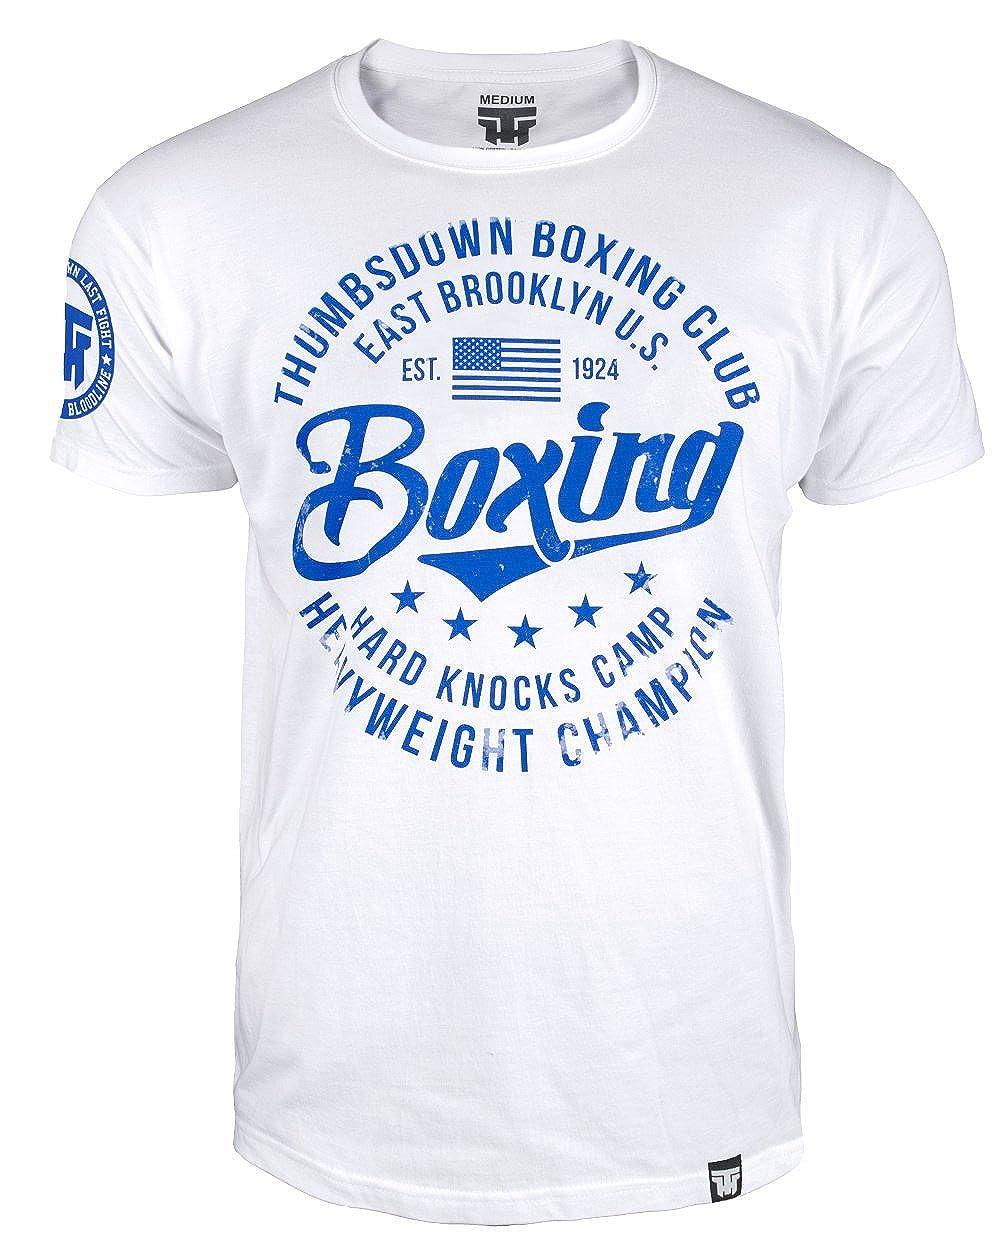 Vêtements Dirty Gym Boxe Boxing Ray Brooklyn K34c De T Shirt Homme Sport YvIf6gby7